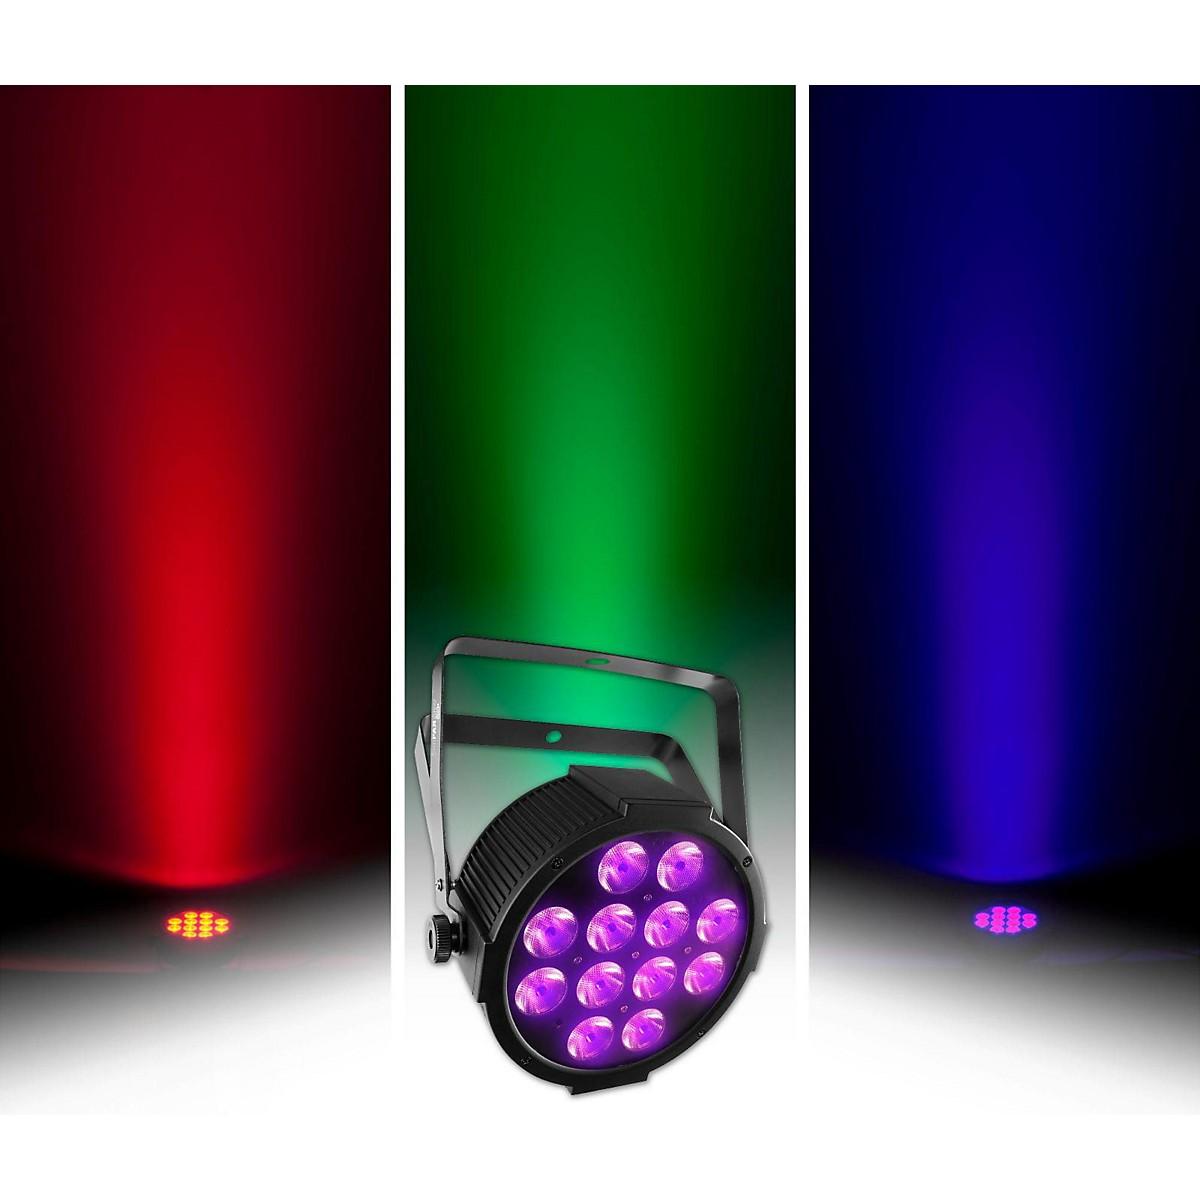 CHAUVET DJ SlimPAR QUV12 USB Par-Style LED Wash/Black Light